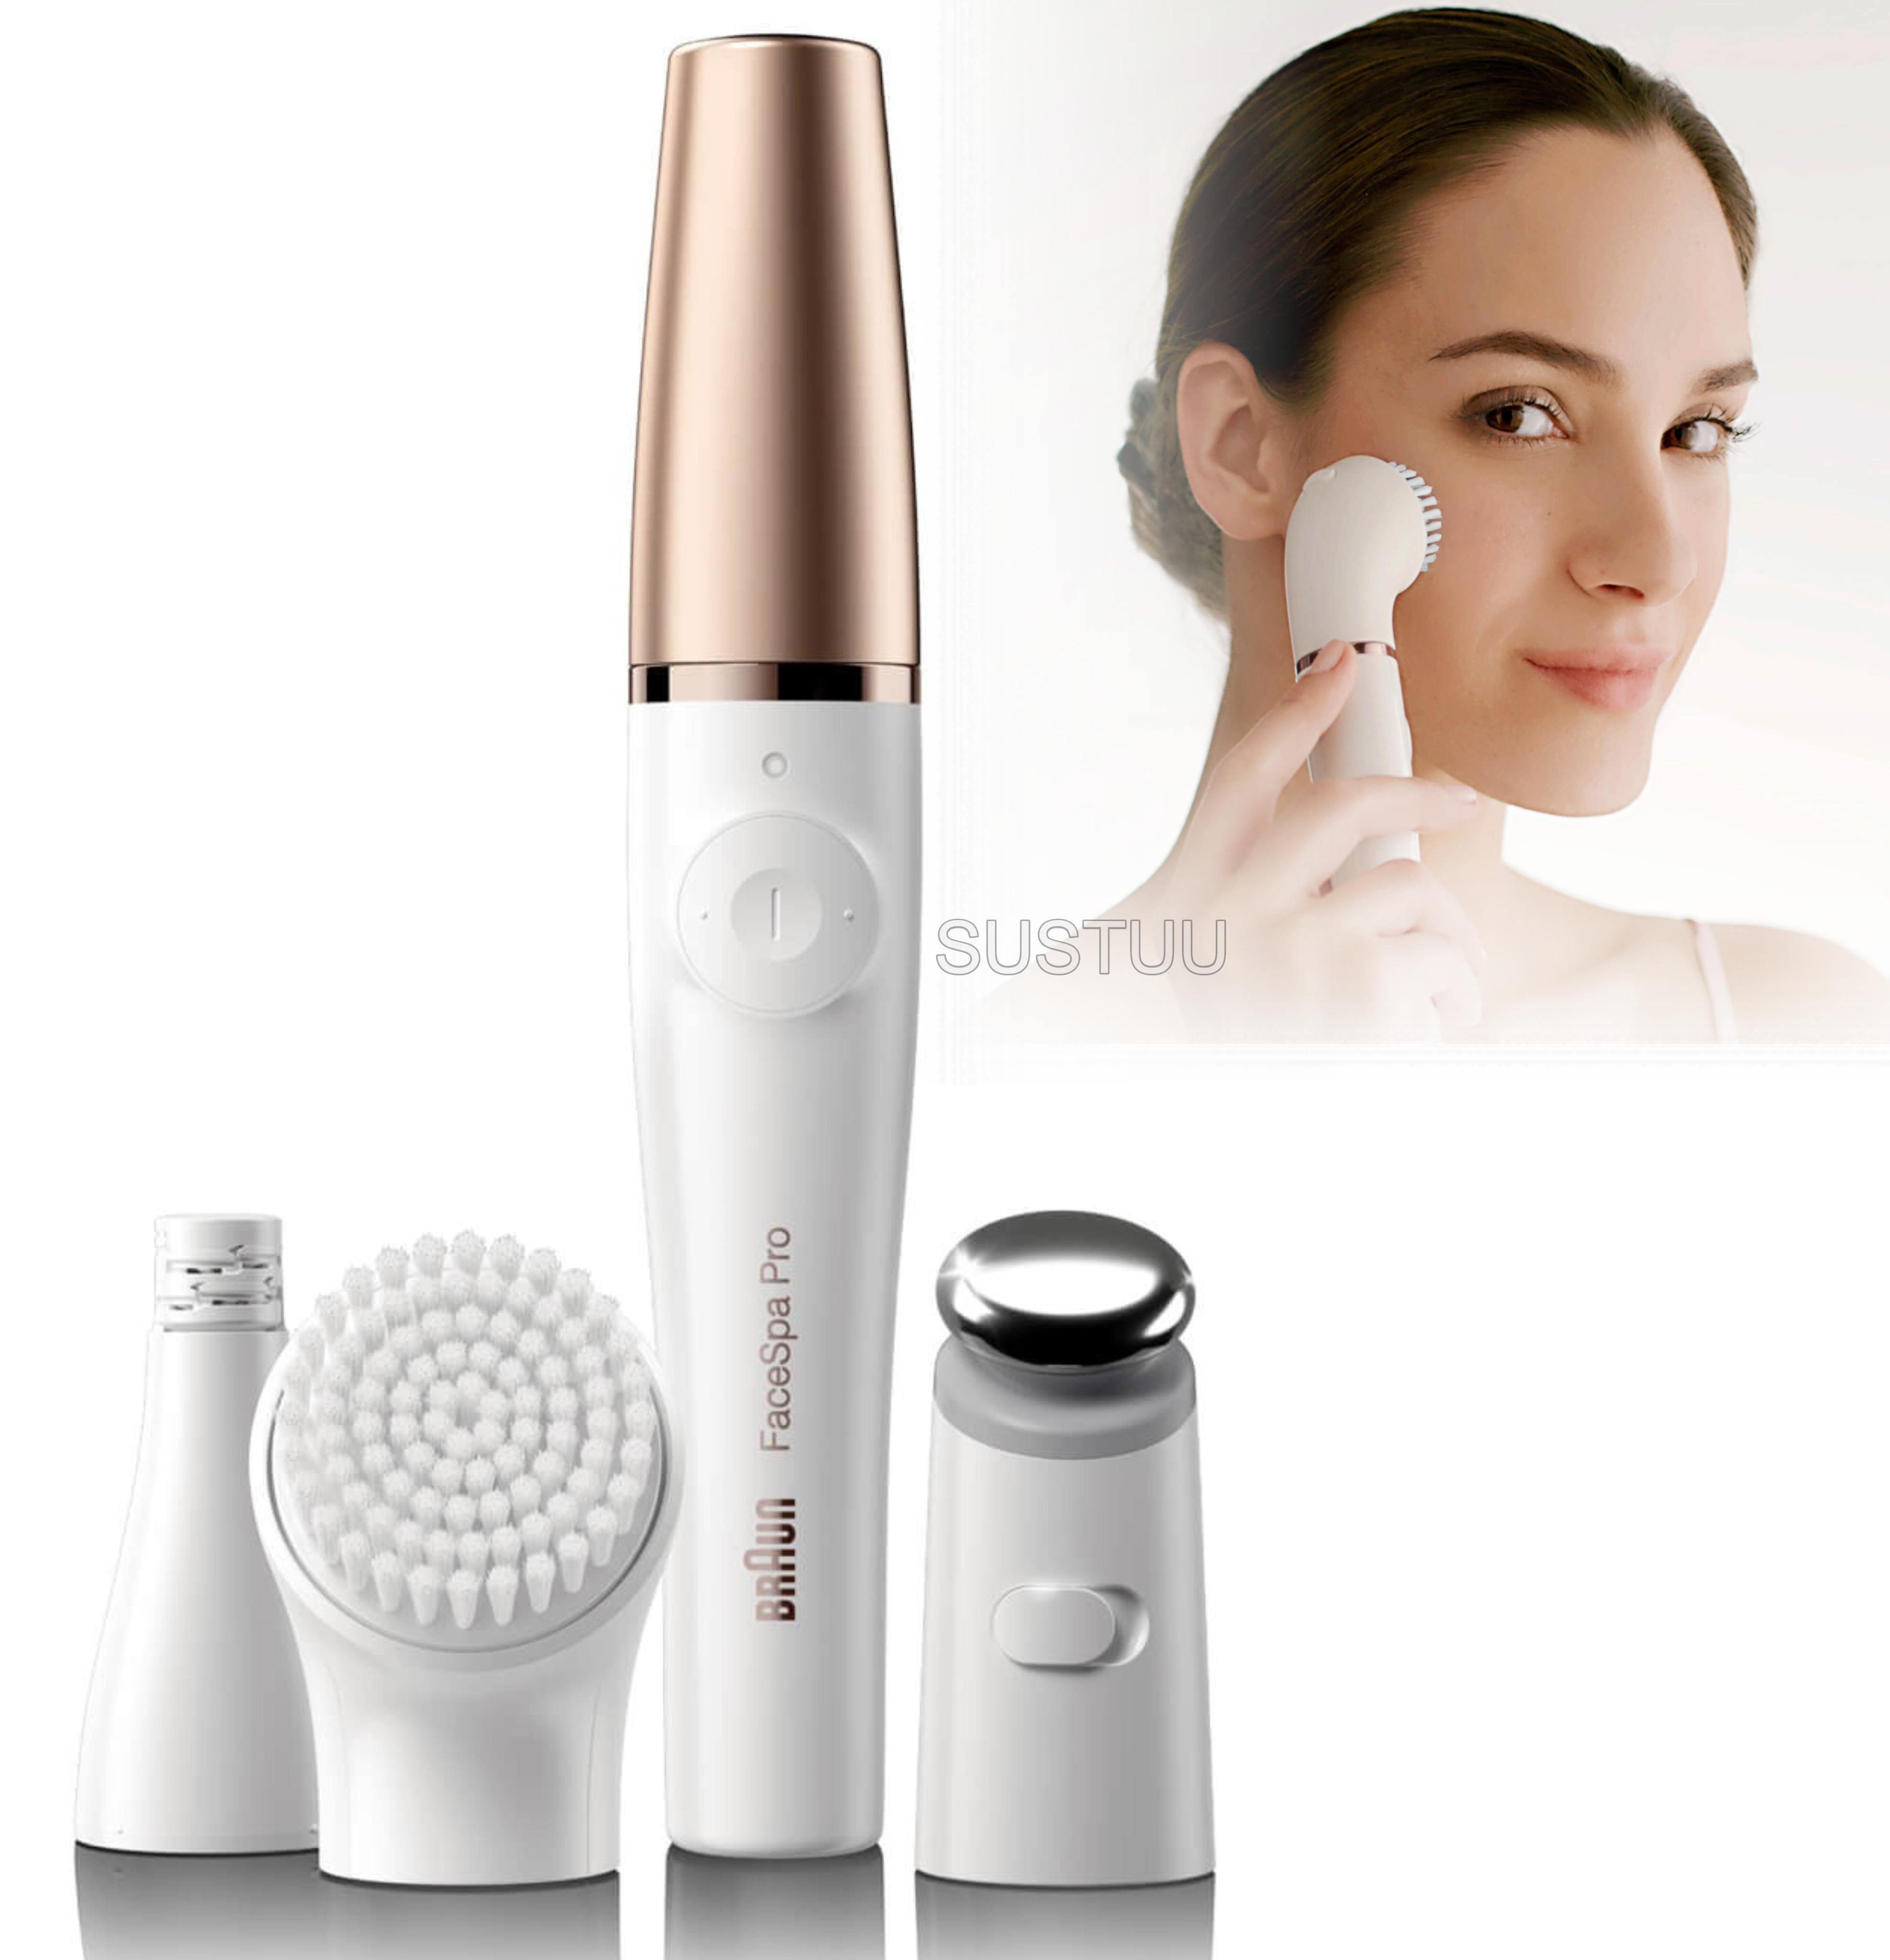 Braun FaceSpa Pro 3 in 1 | Facial Epilation-Cleansing & Skin Toning System | 3 Extra